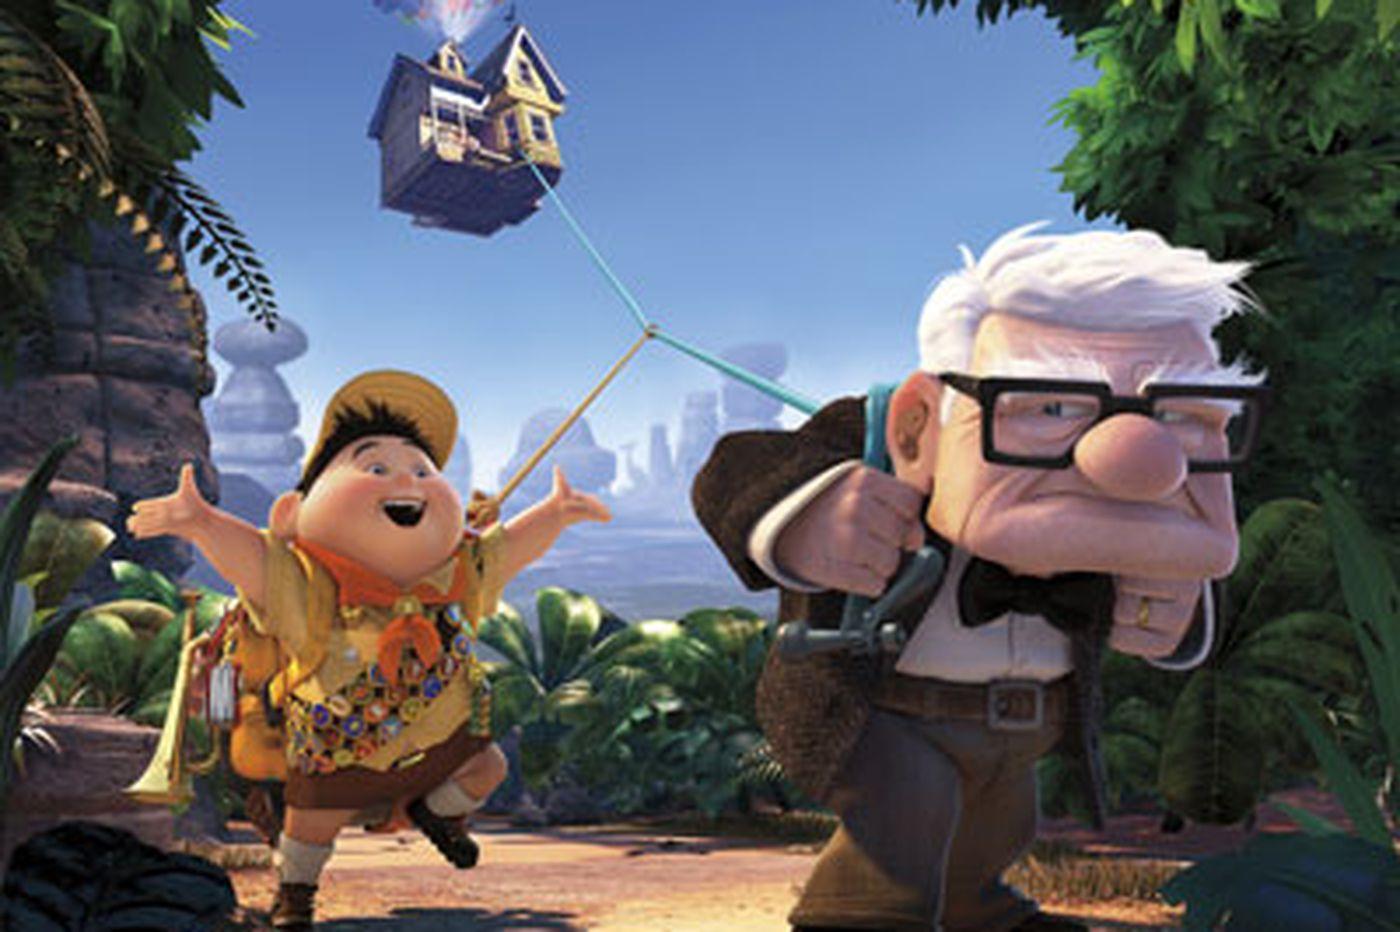 Bravo for Pixar's 'Up'